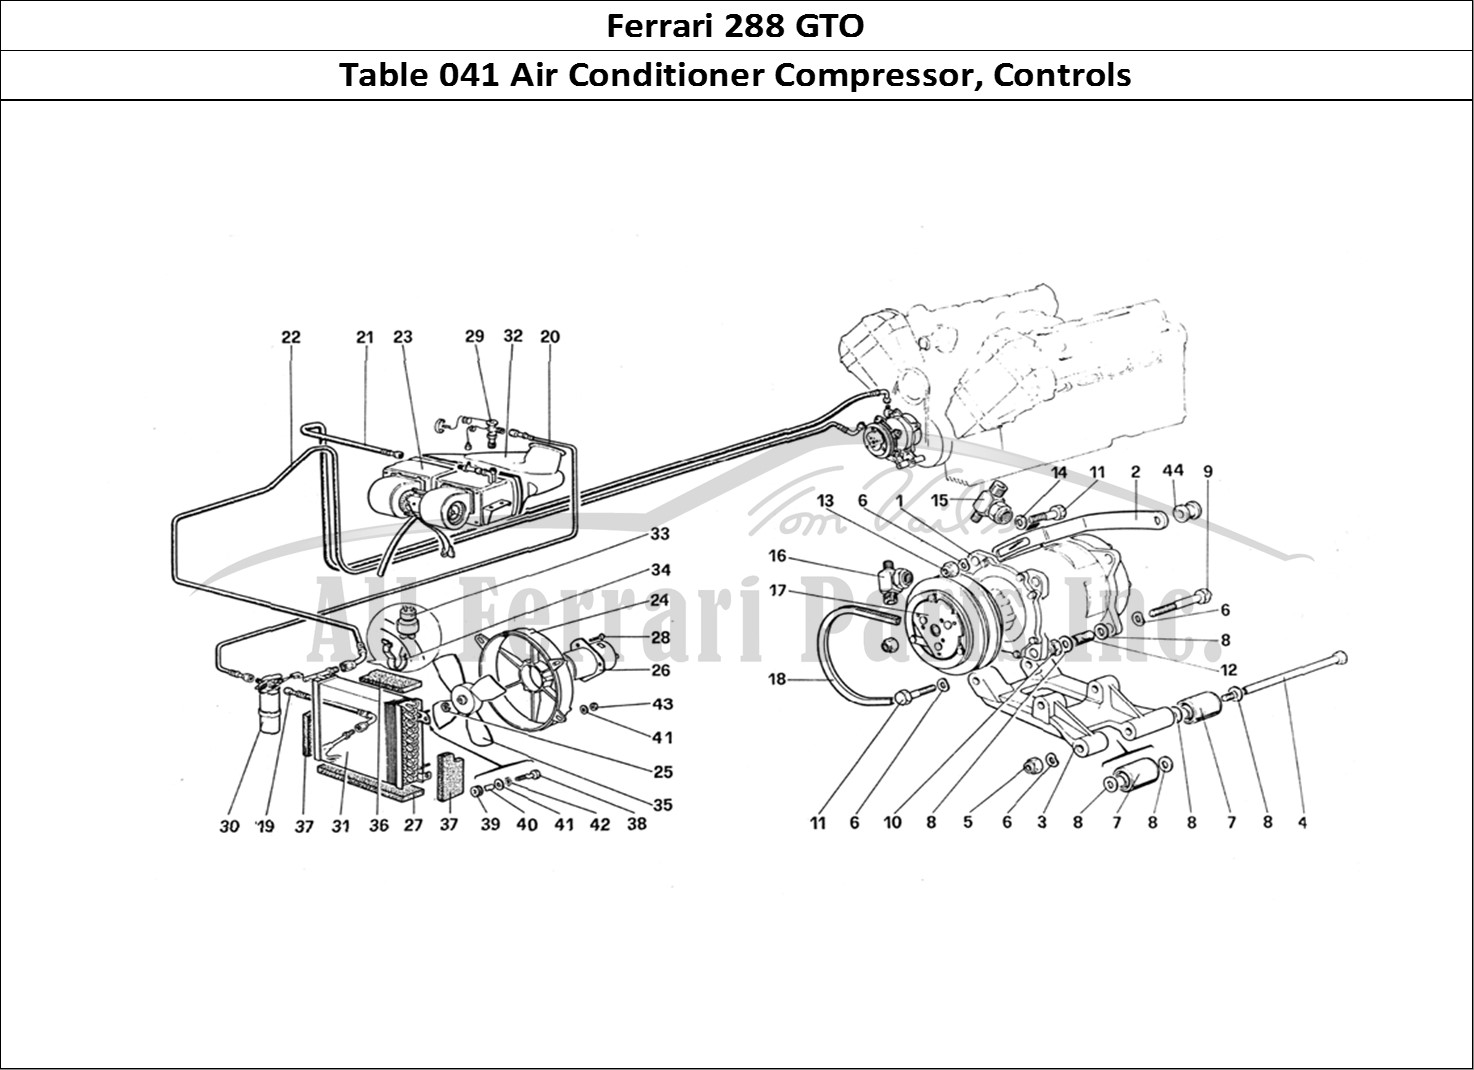 Buy Original Ferrari 288 Gto 041 Air Conditioner Compressor Controls Ferrari Parts Spares